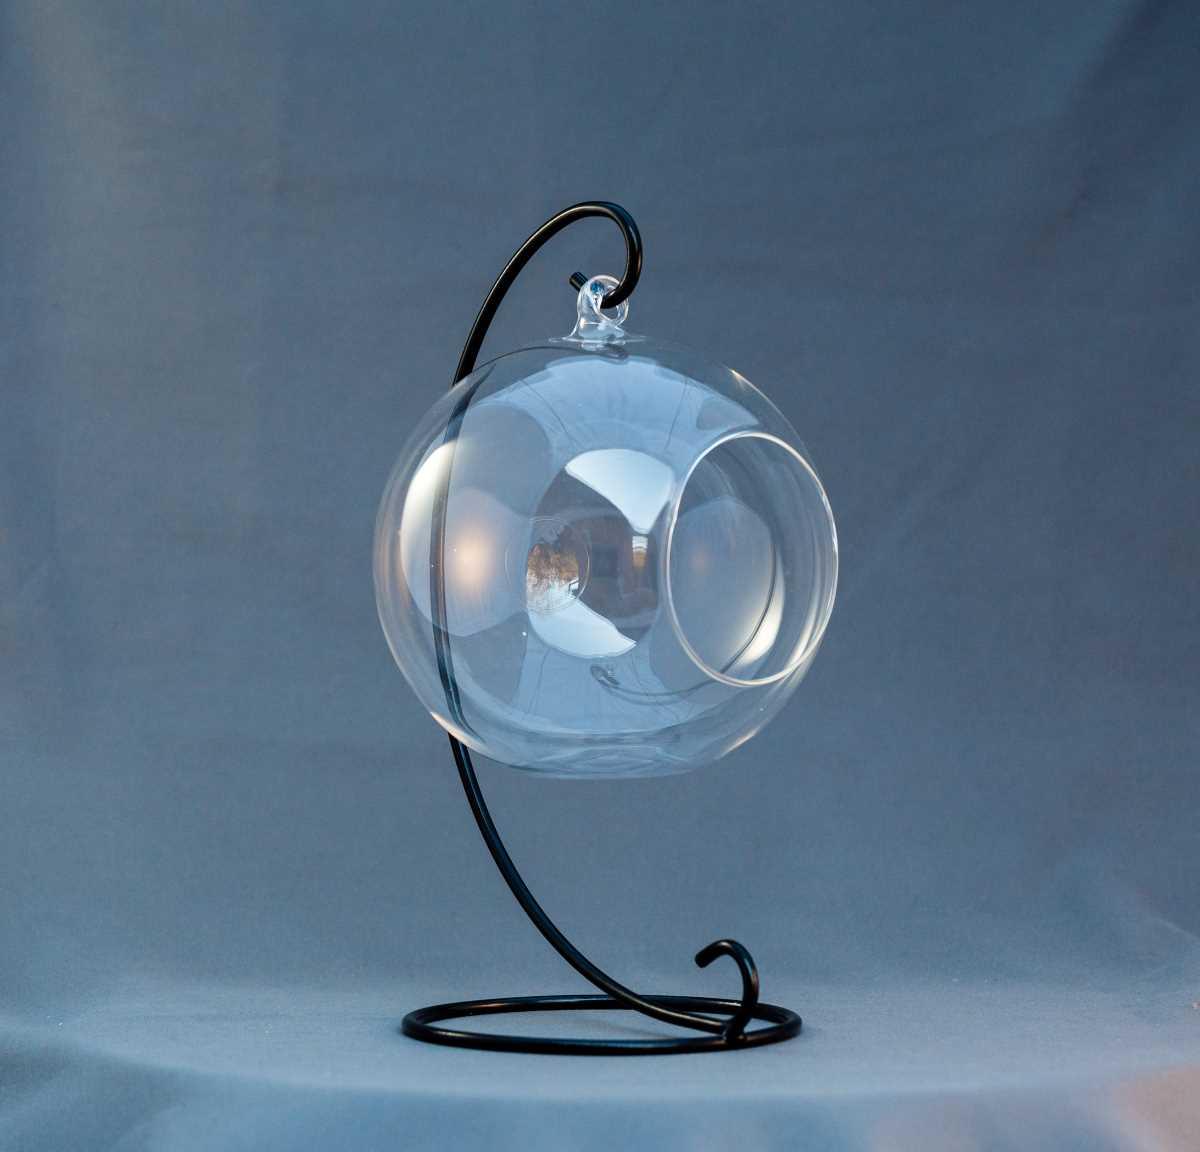 vas terariu in forma de glob, din sticla, suport negru, greenarium